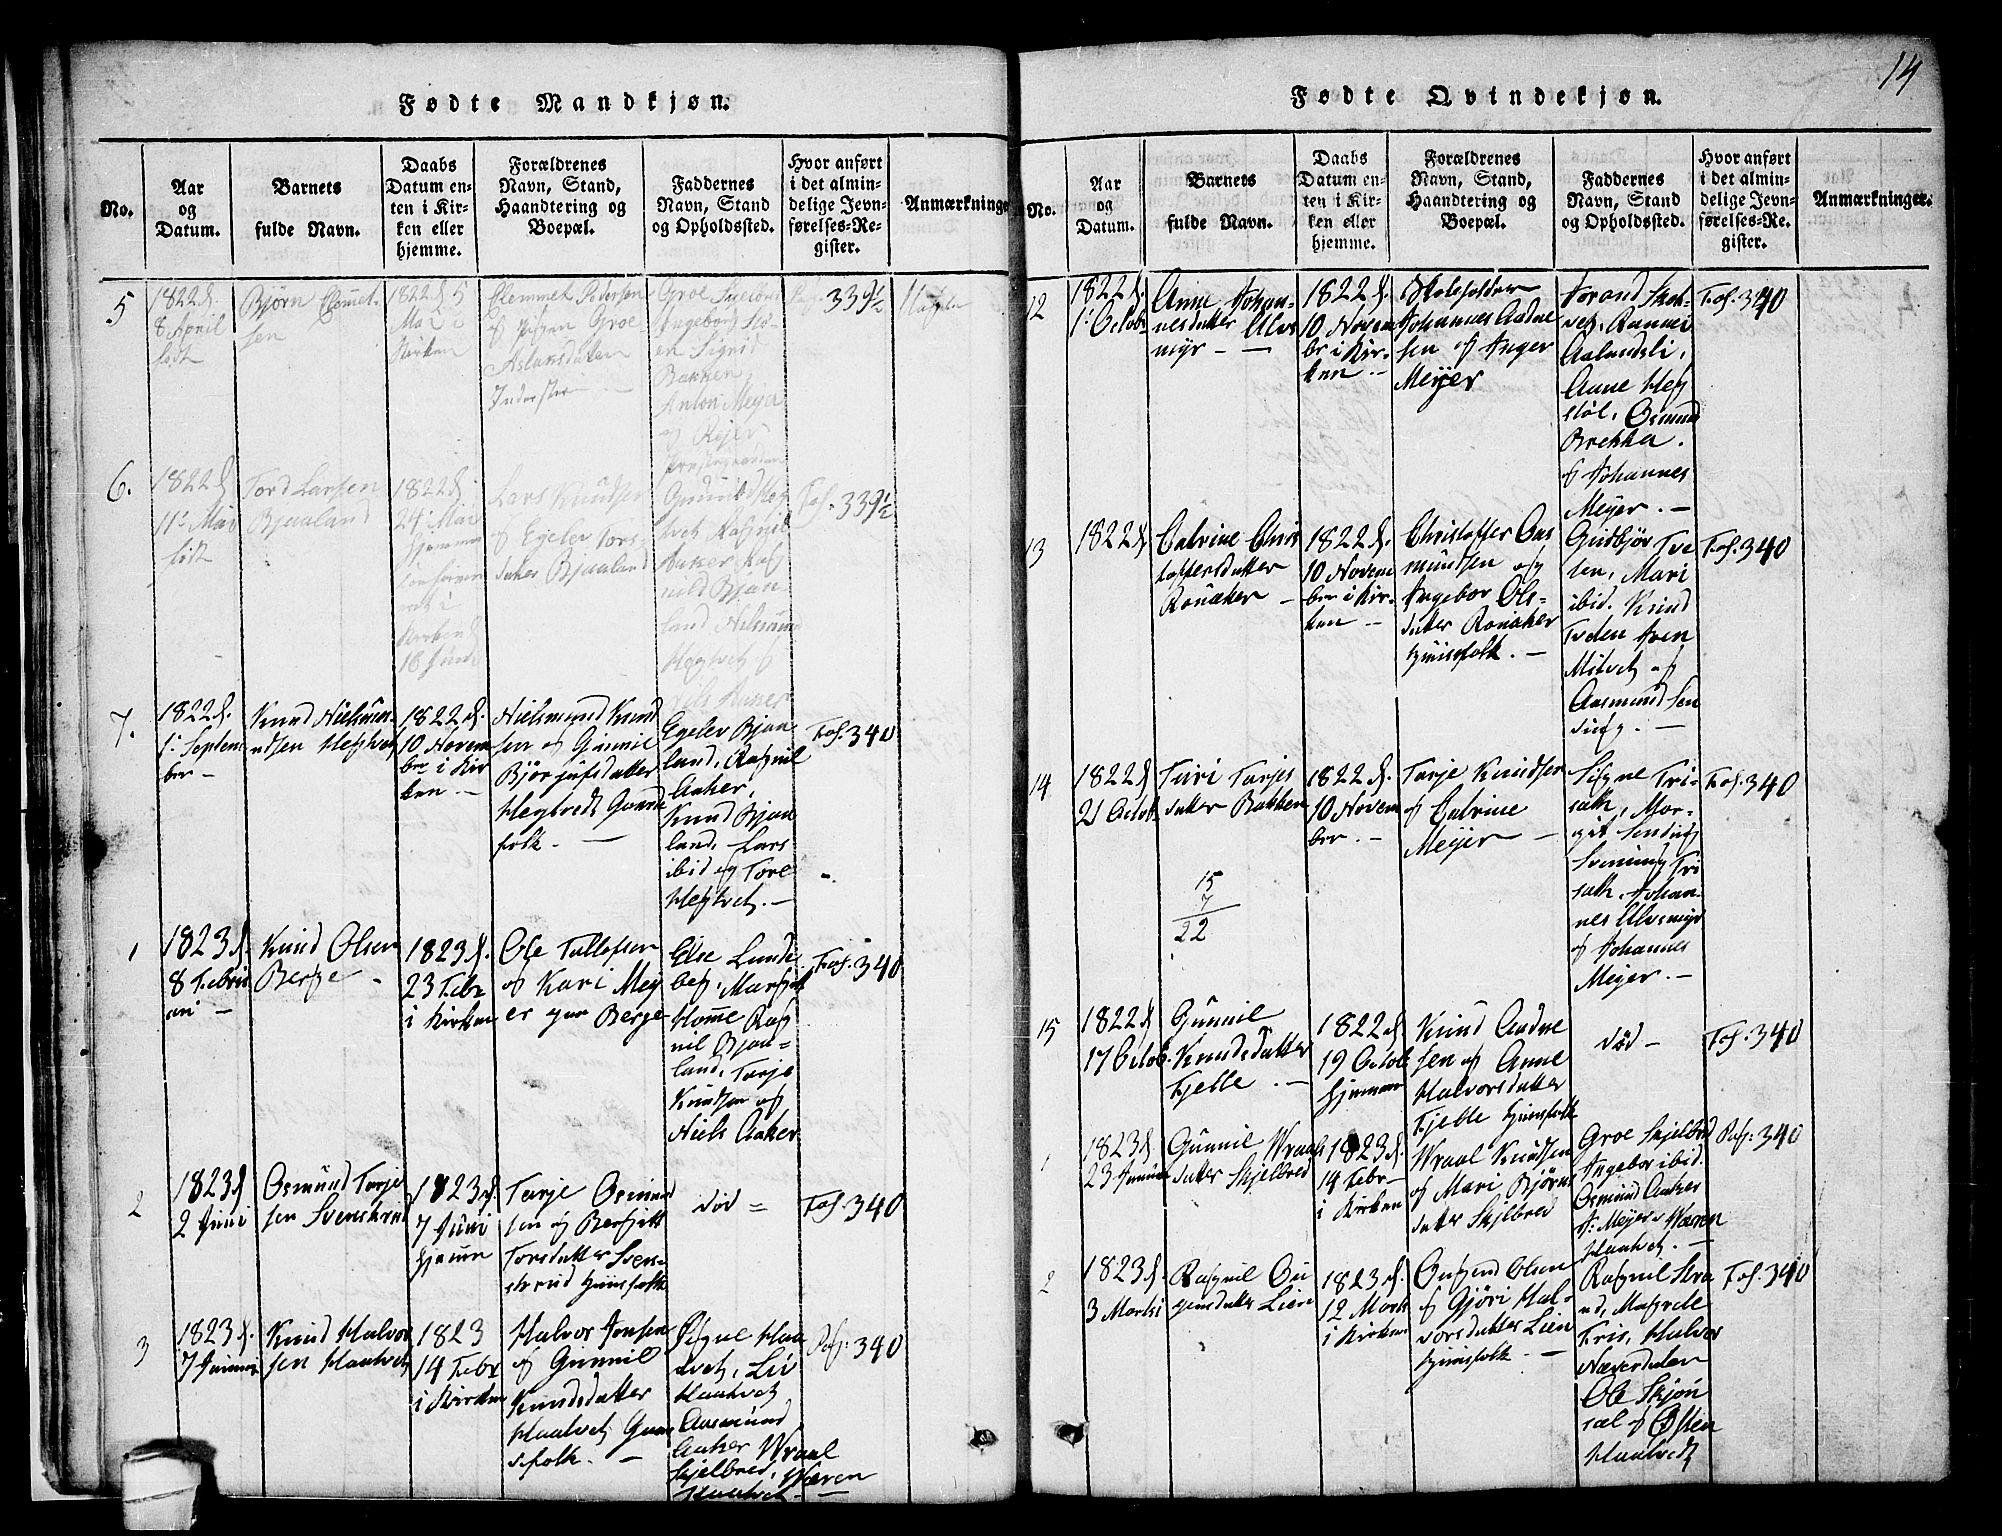 SAKO, Lårdal kirkebøker, G/Ga/L0001: Klokkerbok nr. I 1, 1815-1861, s. 14